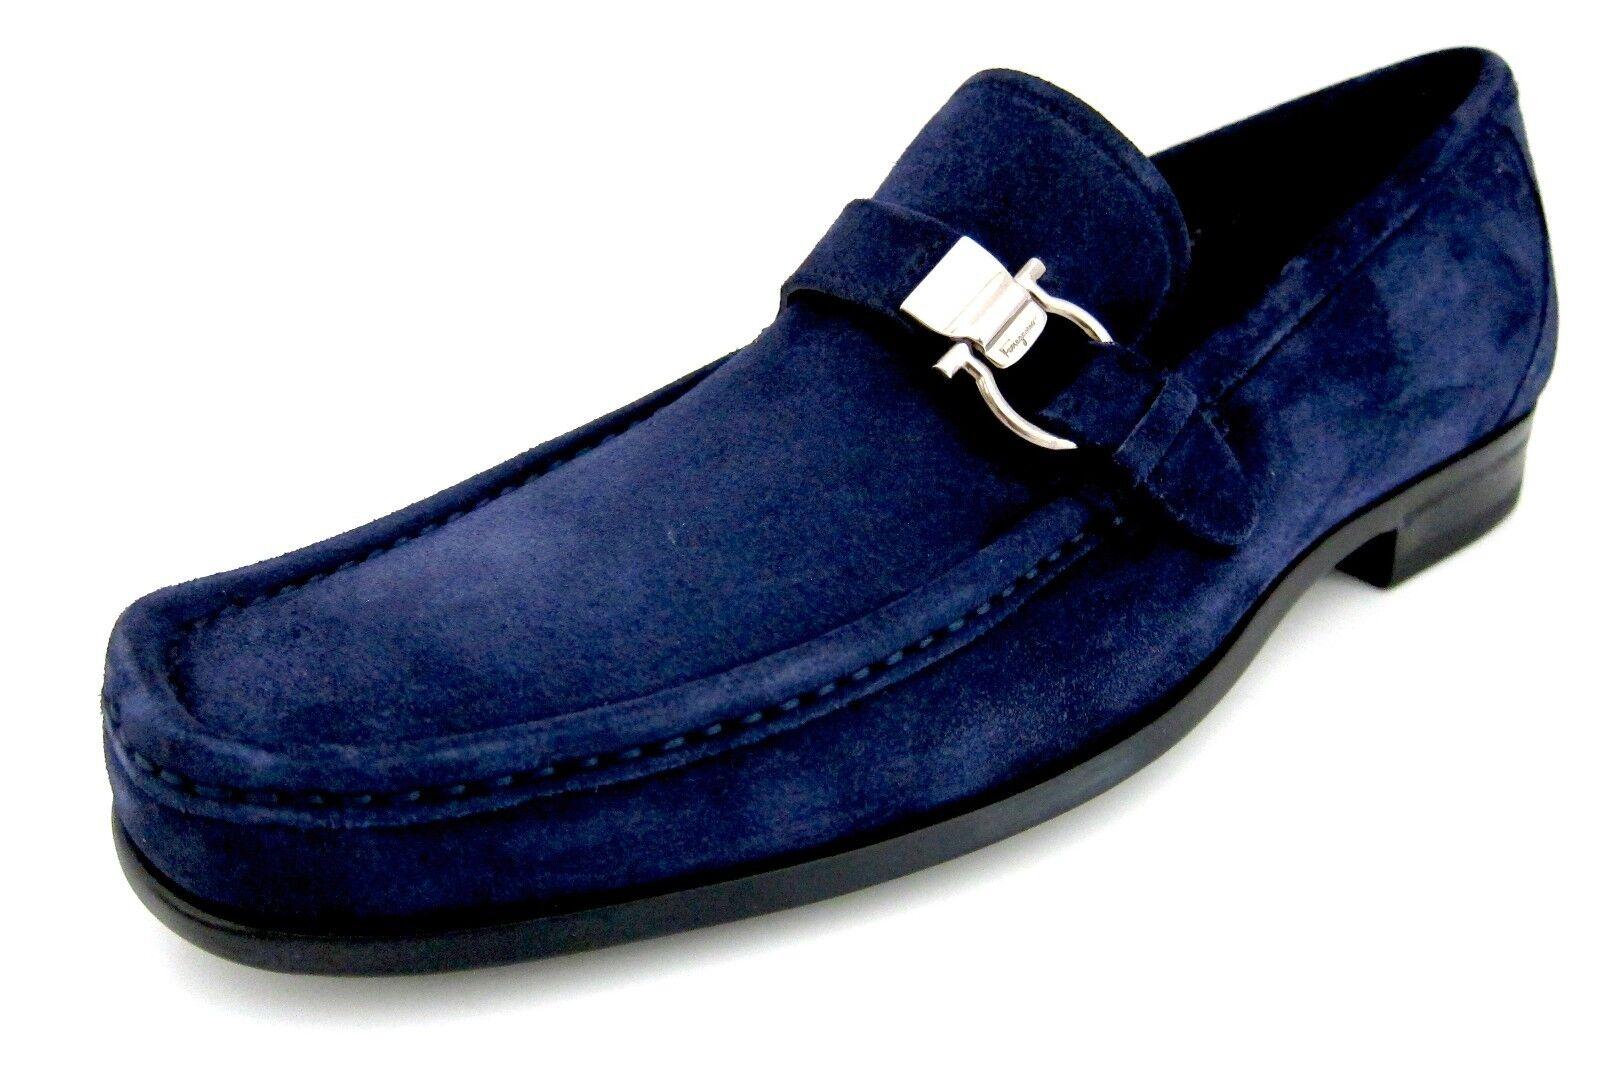 Salvatore Ferragamo Muller Homme Daim Mocassins Chaussures 9